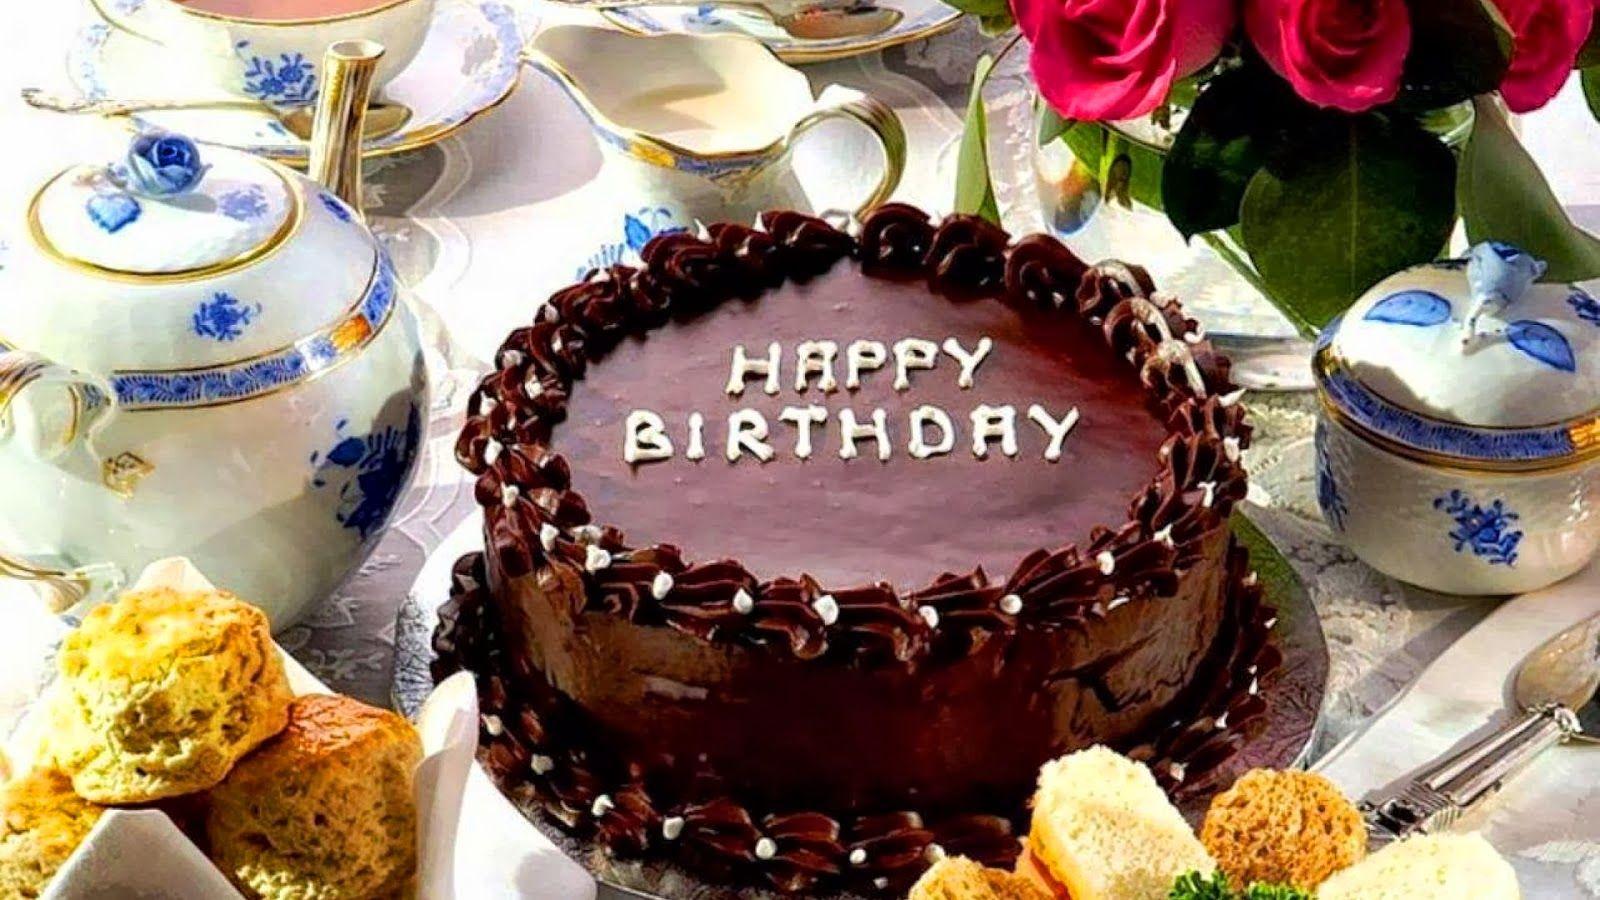 Happy Birthday Wallpapers Pics Images Happy Birthday Chocolate Cake Happy Birthday Cake Pictures Happy Birthday Cake Images